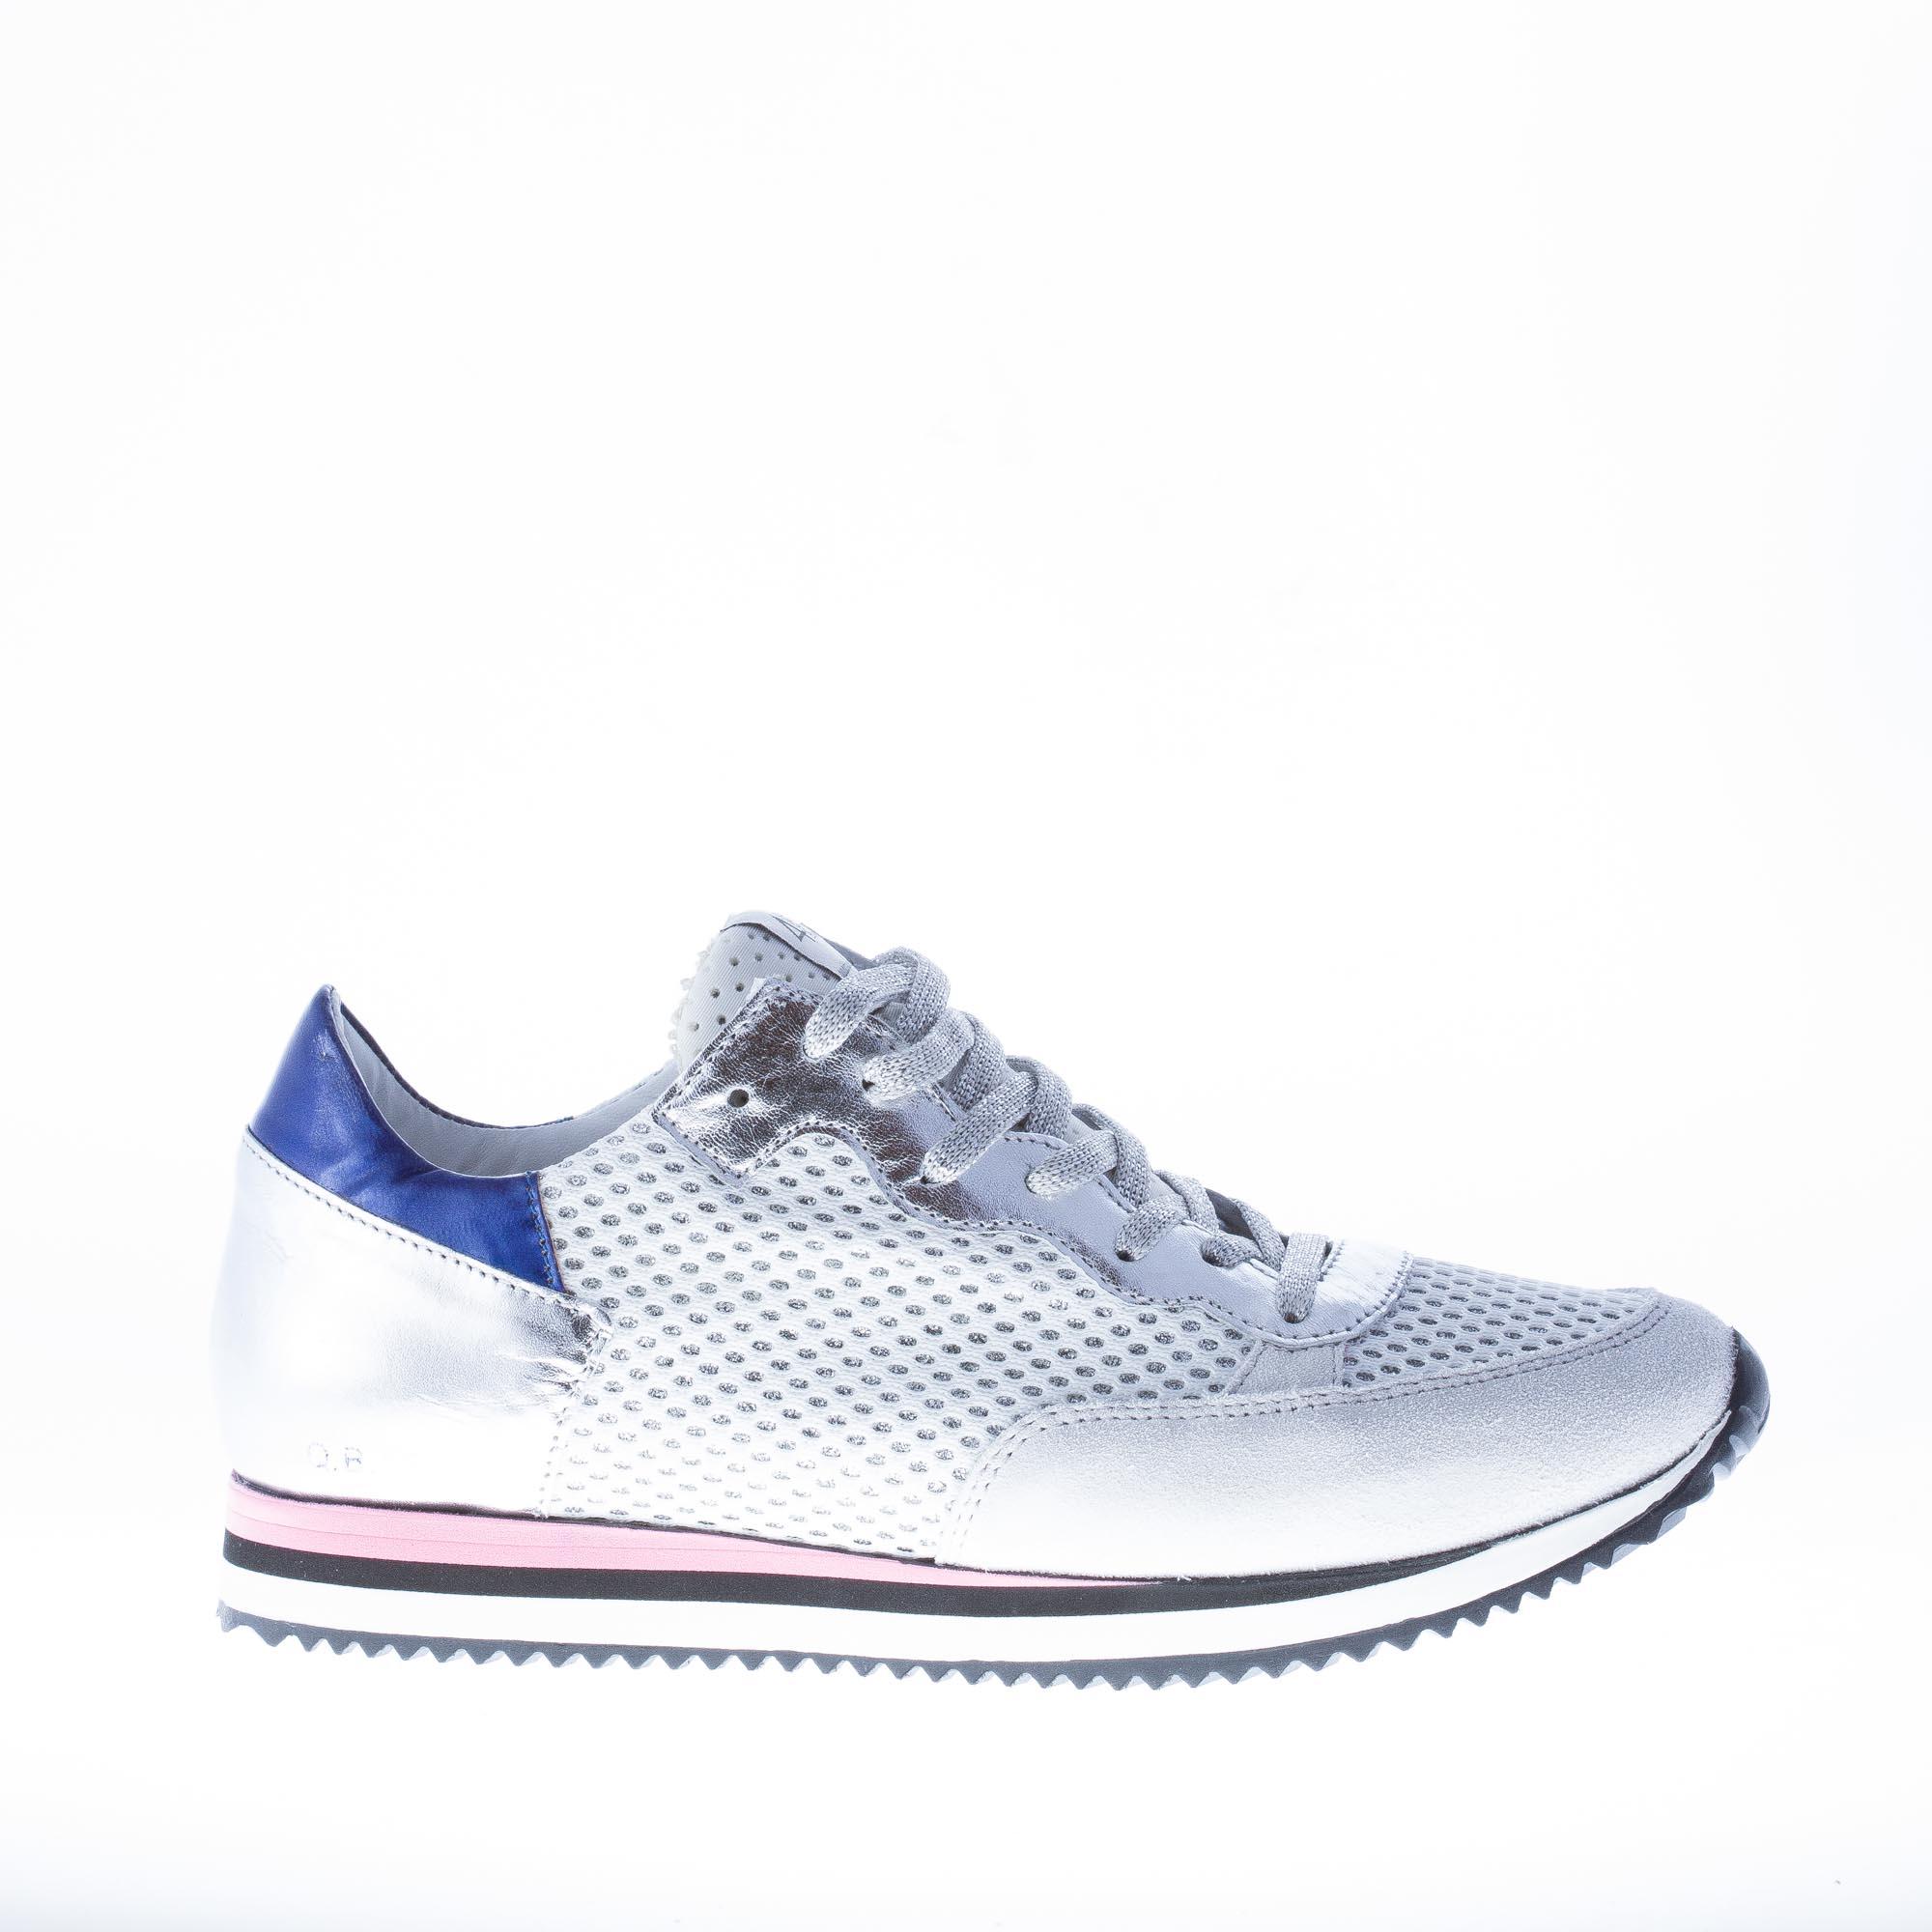 QUATTROBARRADODICI women shoes Silver leather and tech fabric mesh panel sneaker